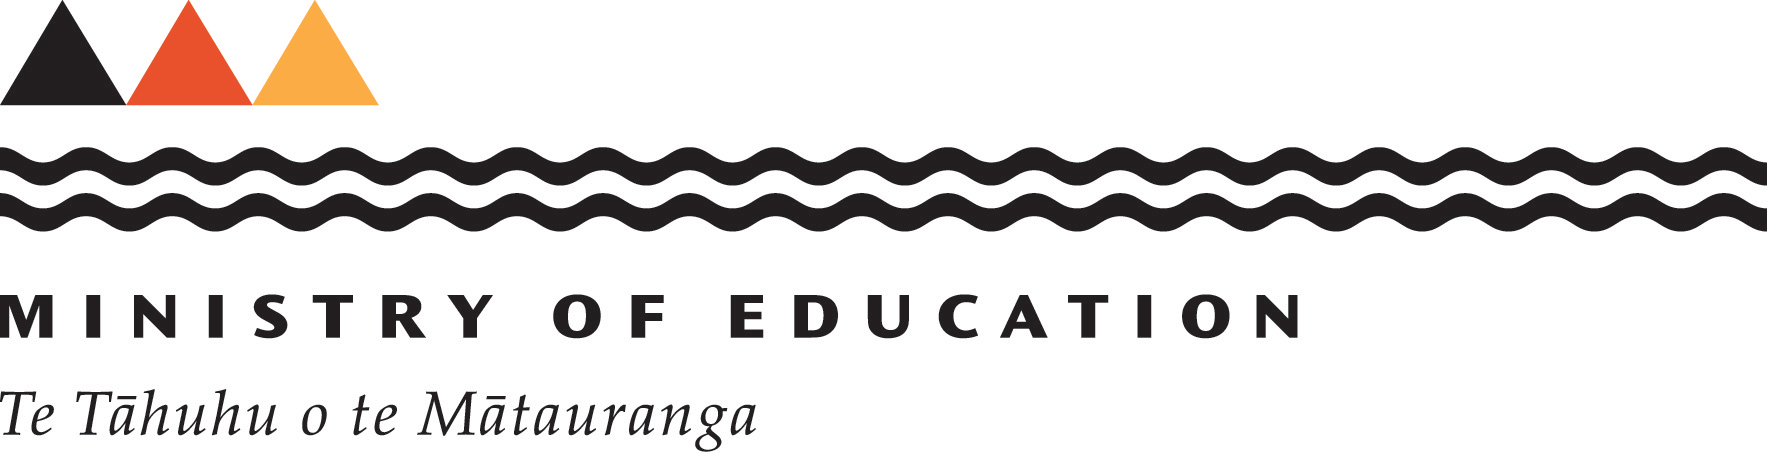 Ministry-of-Education-logo.jpg